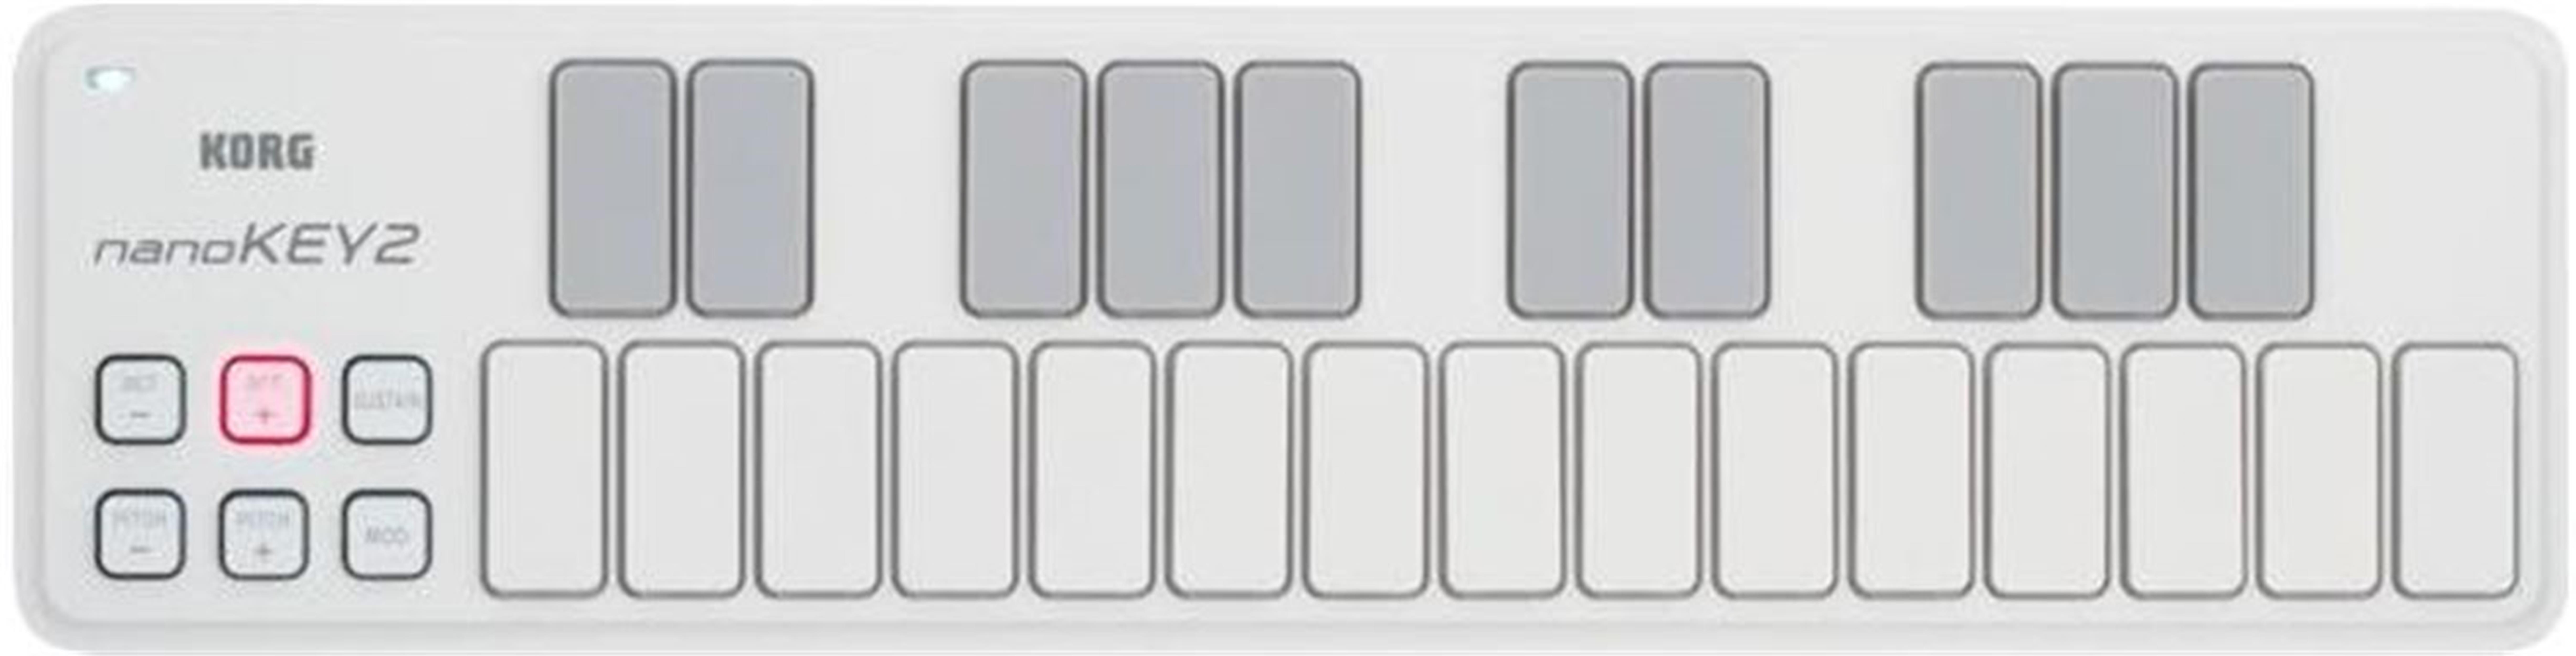 KORG-nano-KEY-2-WH-sku-10906